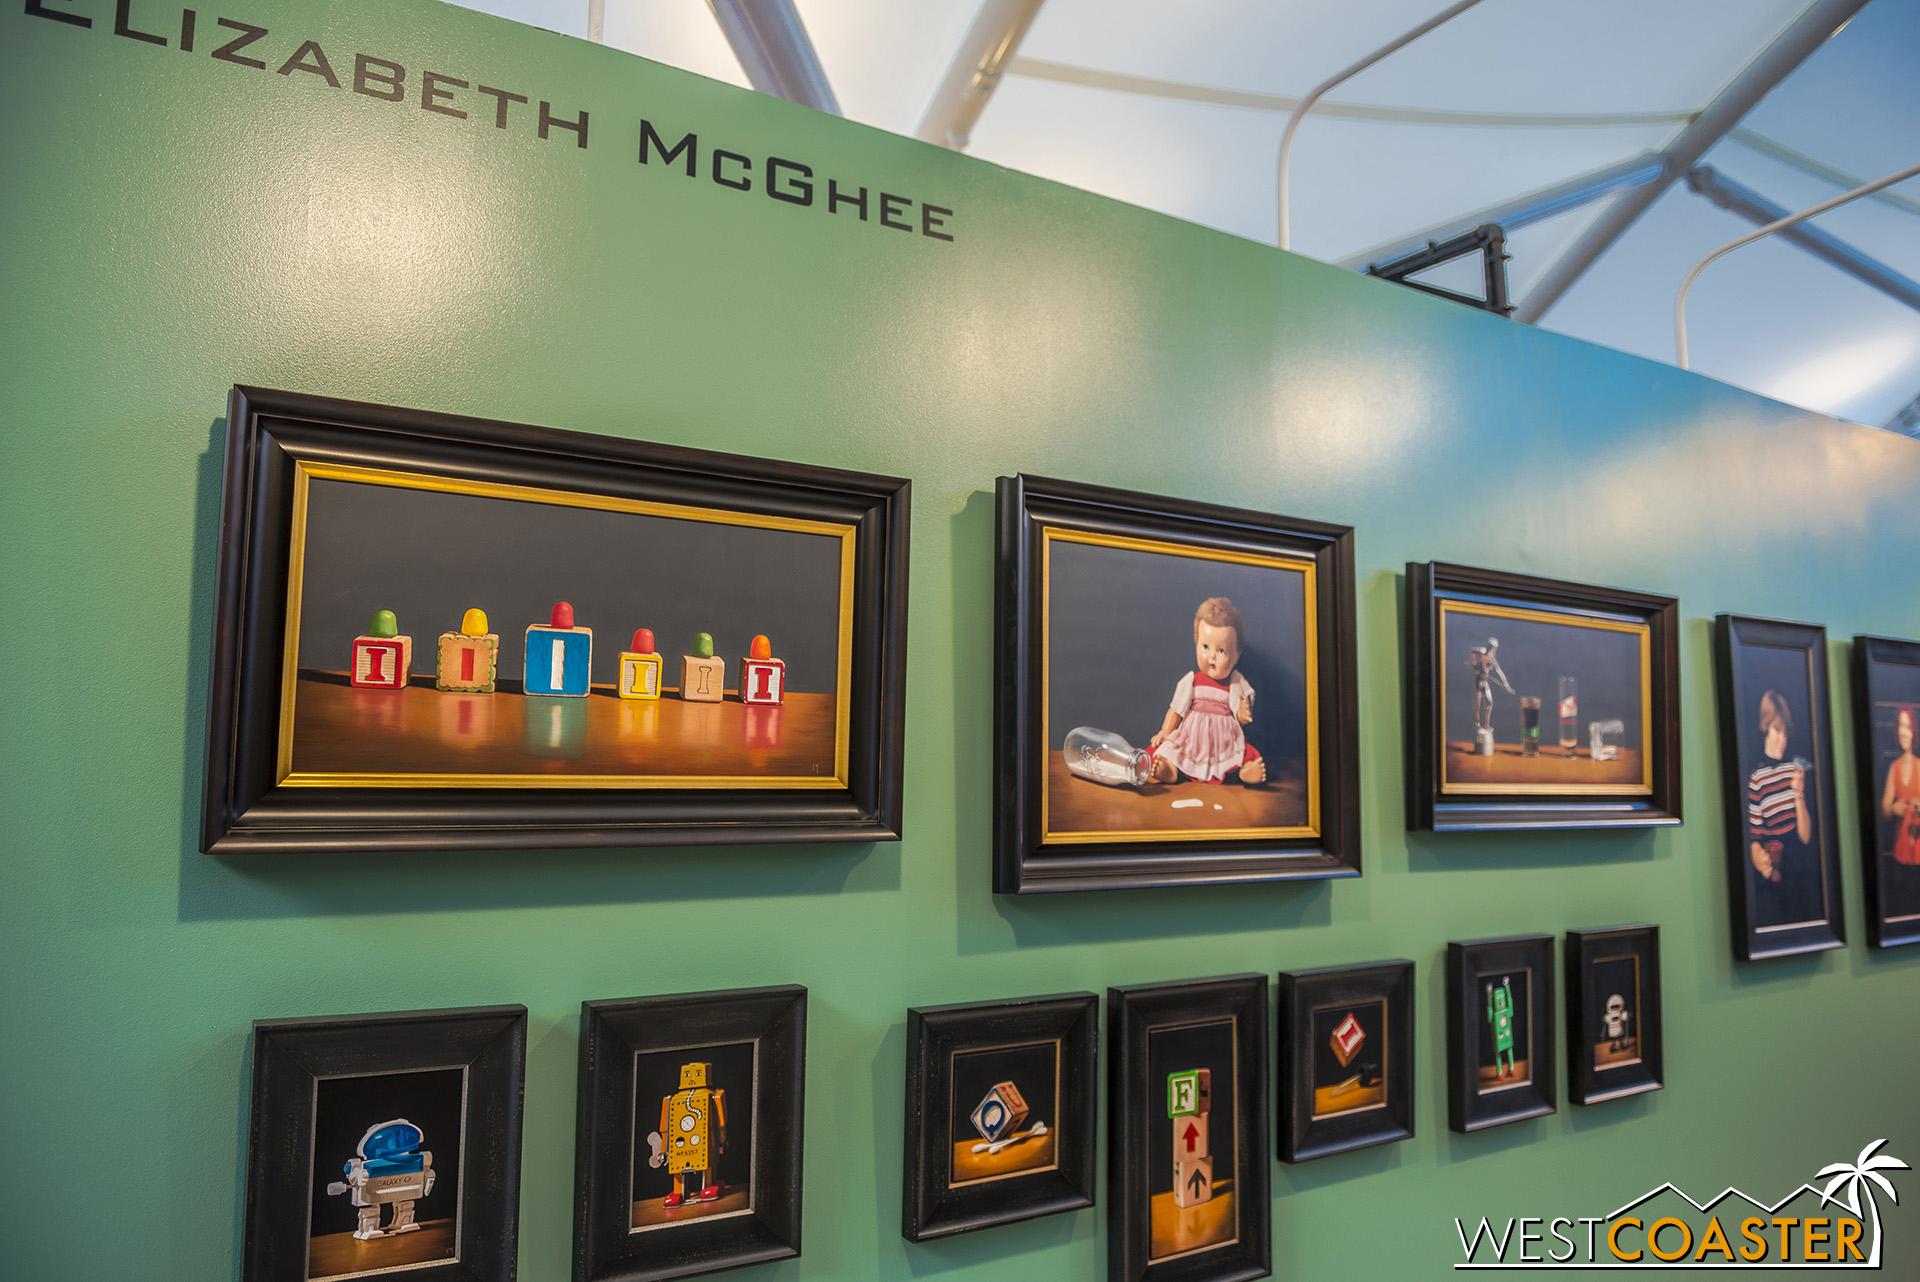 Elizabeth McGee enjoys placing hidden messages—often puns or cheeky jokes—in her art.